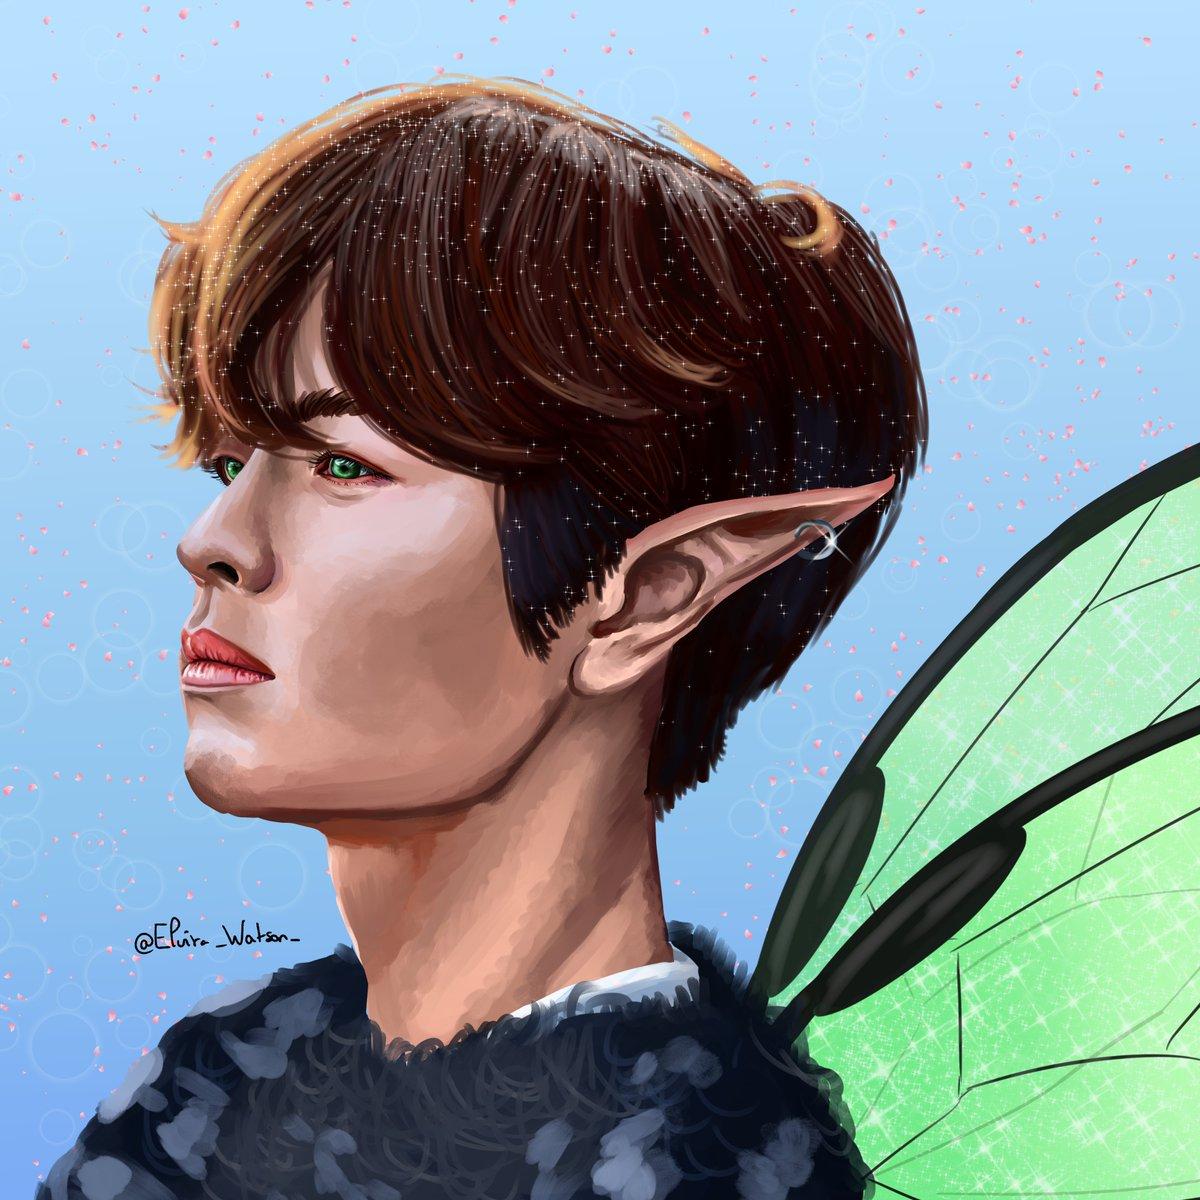 @Stray_Kids Fairy Seungmin - Levanter- Green wings for Fairy Seungmin uwu   #straykids #straykids_levanter #Seungmin #kimseungmin #Seungminstraykids #straykidfanart  #CLIPSTUDIO #Seungminfanart